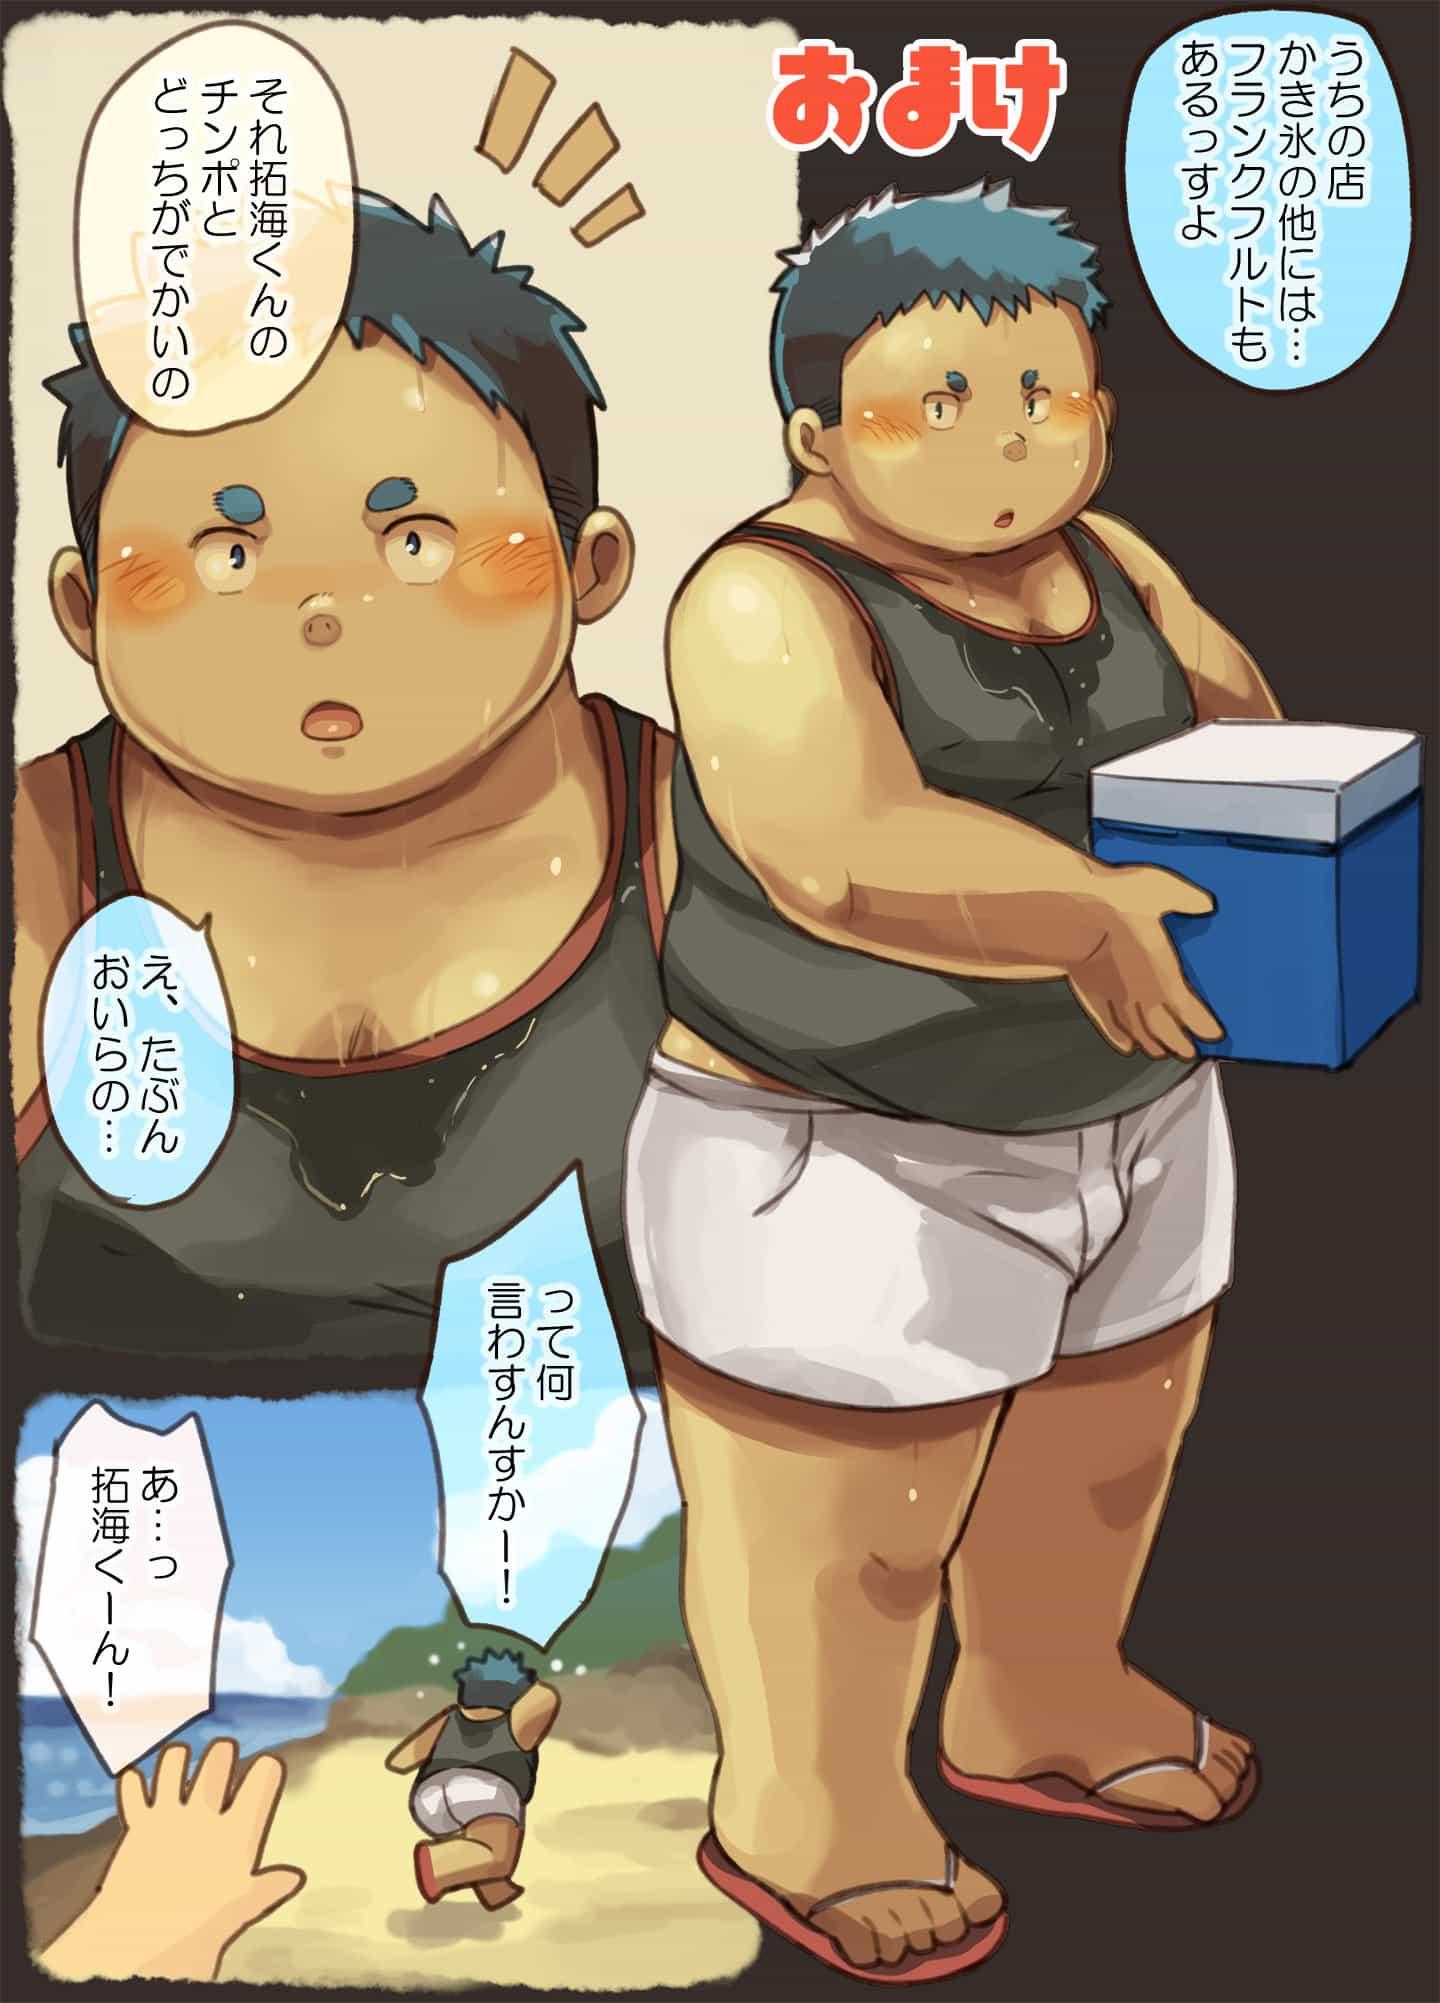 bbm chubby males